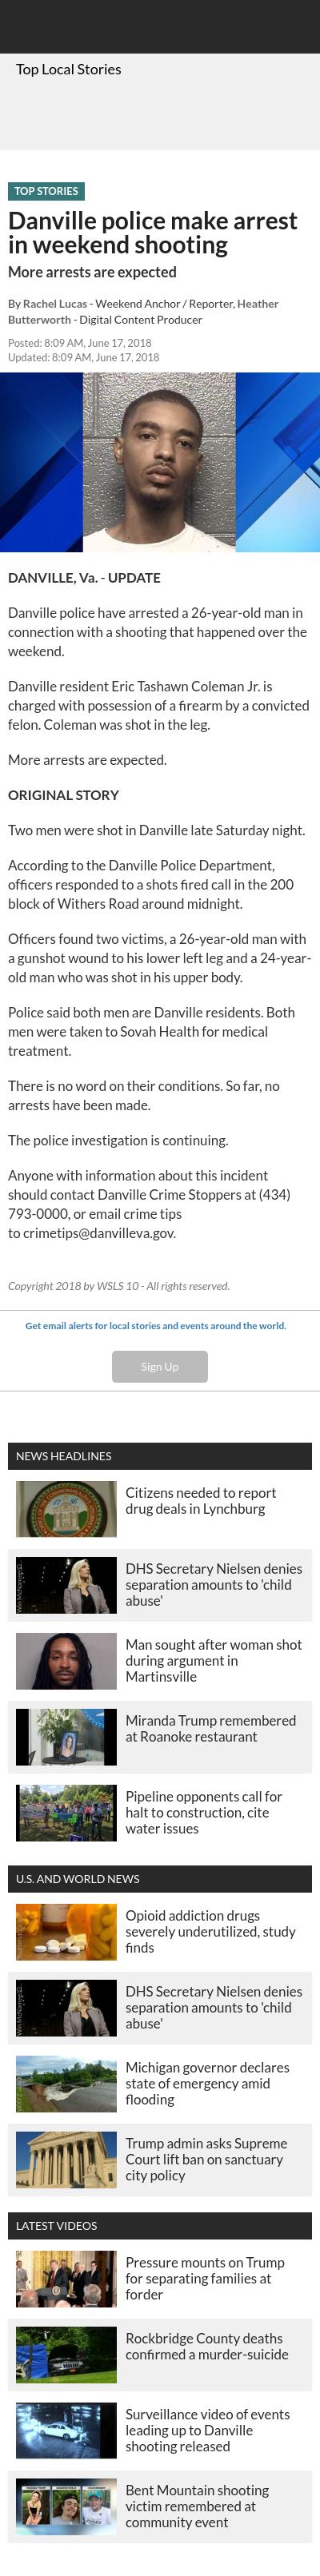 danville va police incident report - Madran kaptanband co